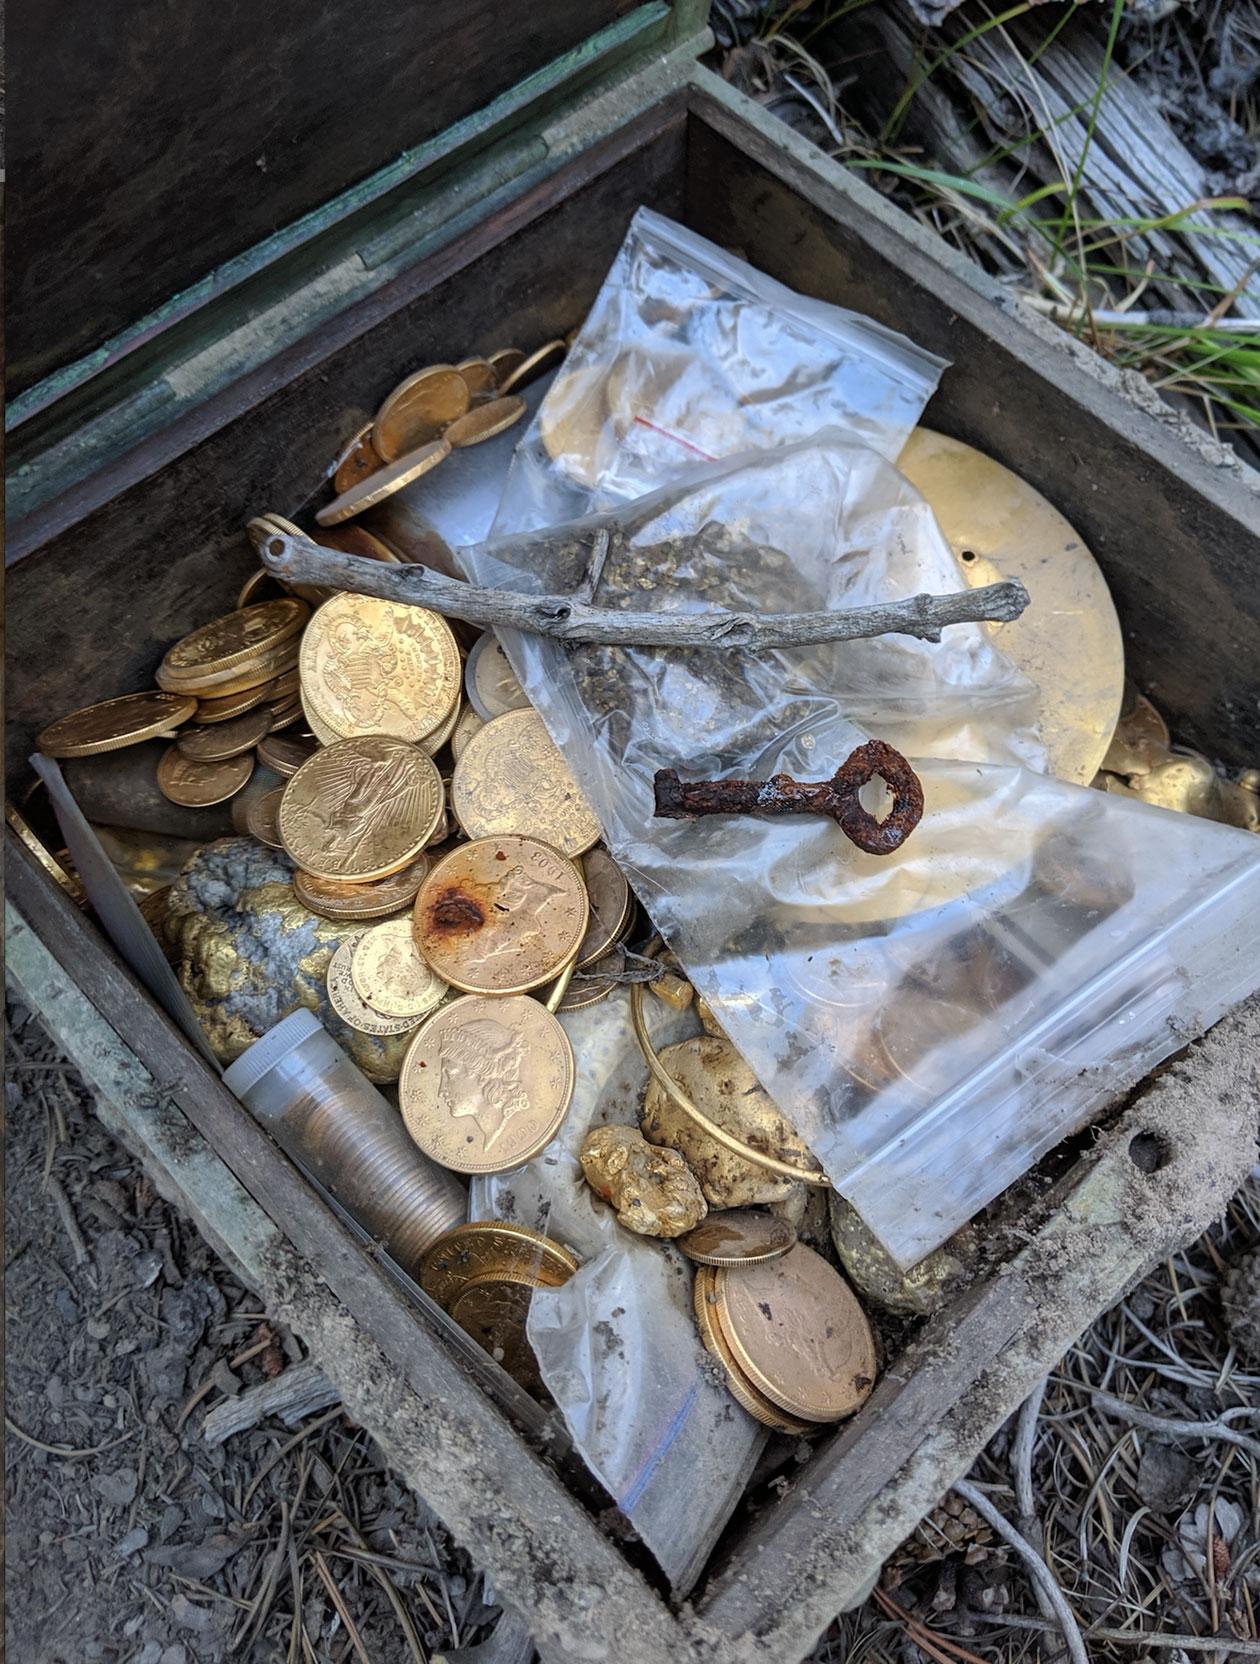 A photo proving Fenn's treasure has been found